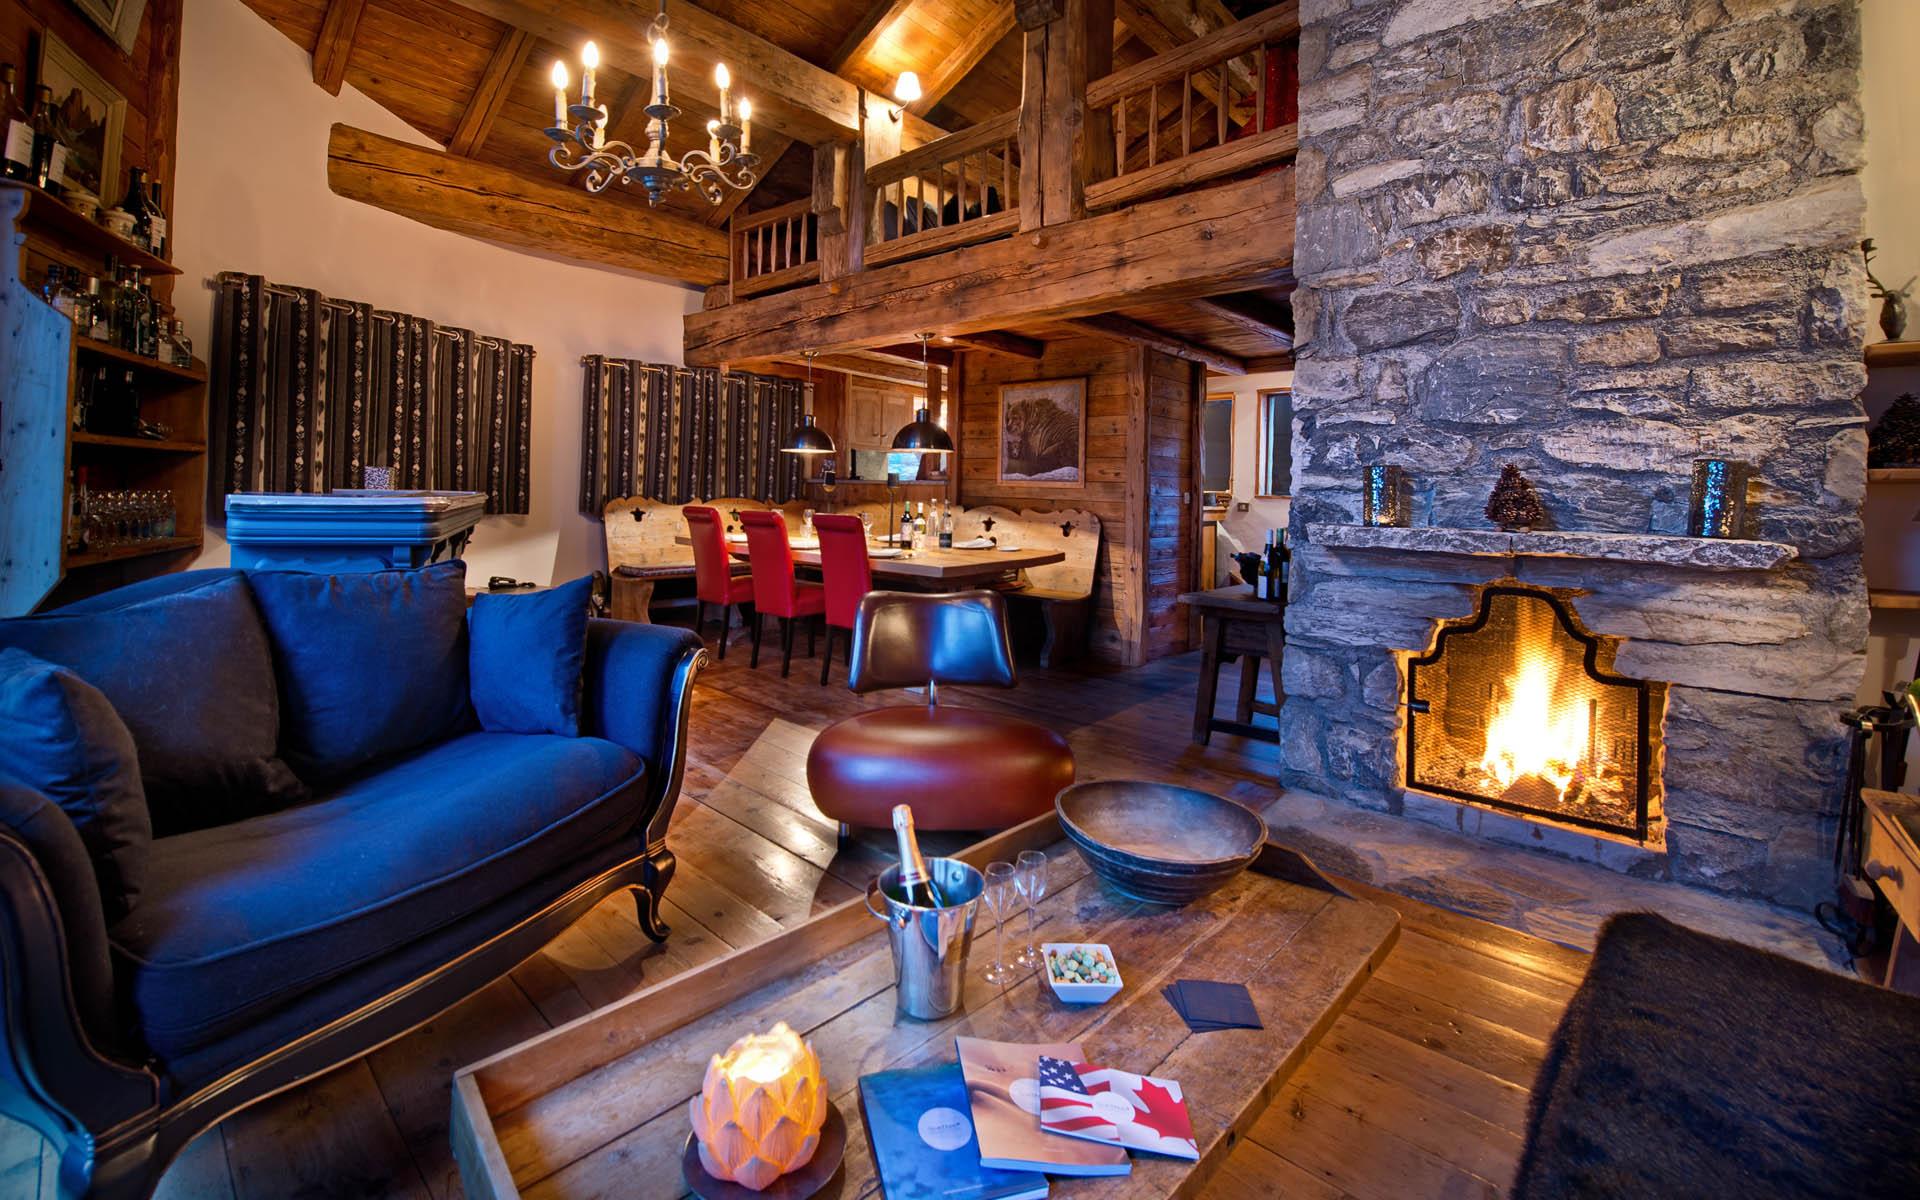 Wallpaper Hd Wallpaper Modern Ski Chalet Living Room Viahouse Com